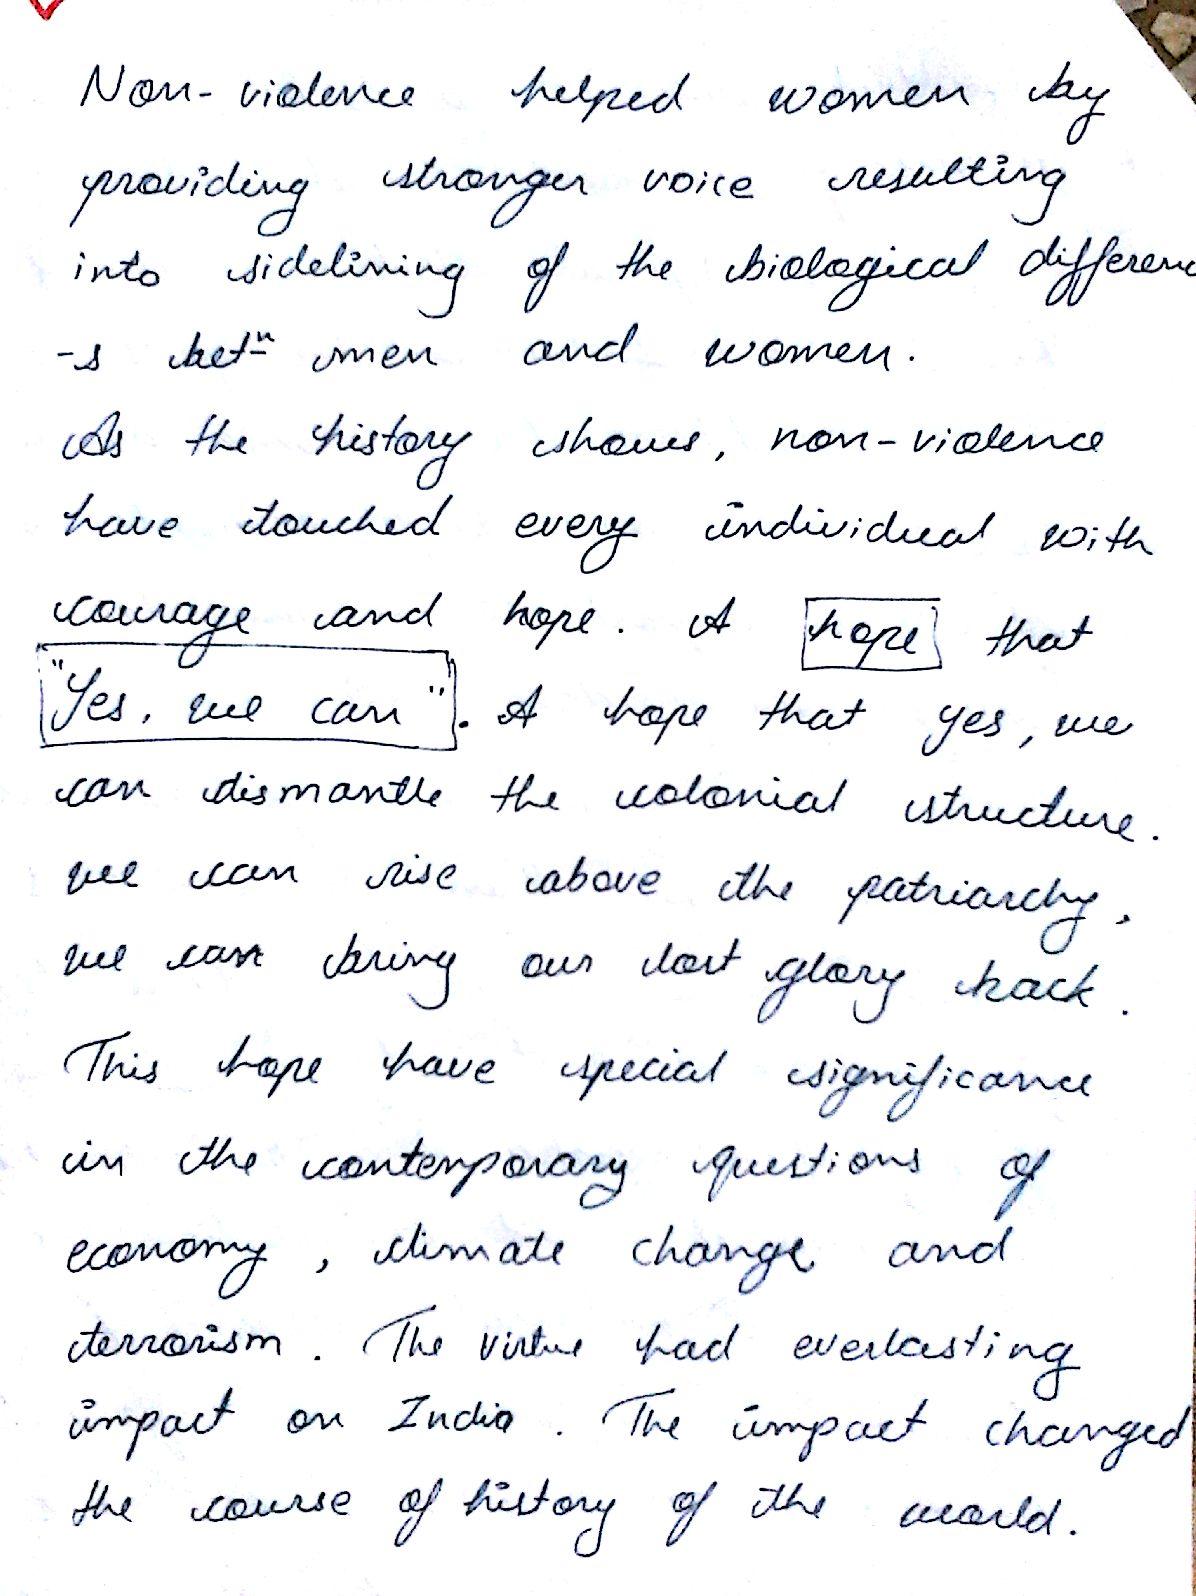 003 Terrorism Essay Example New Doc 20 8 Wonderful Topics In English War On Full